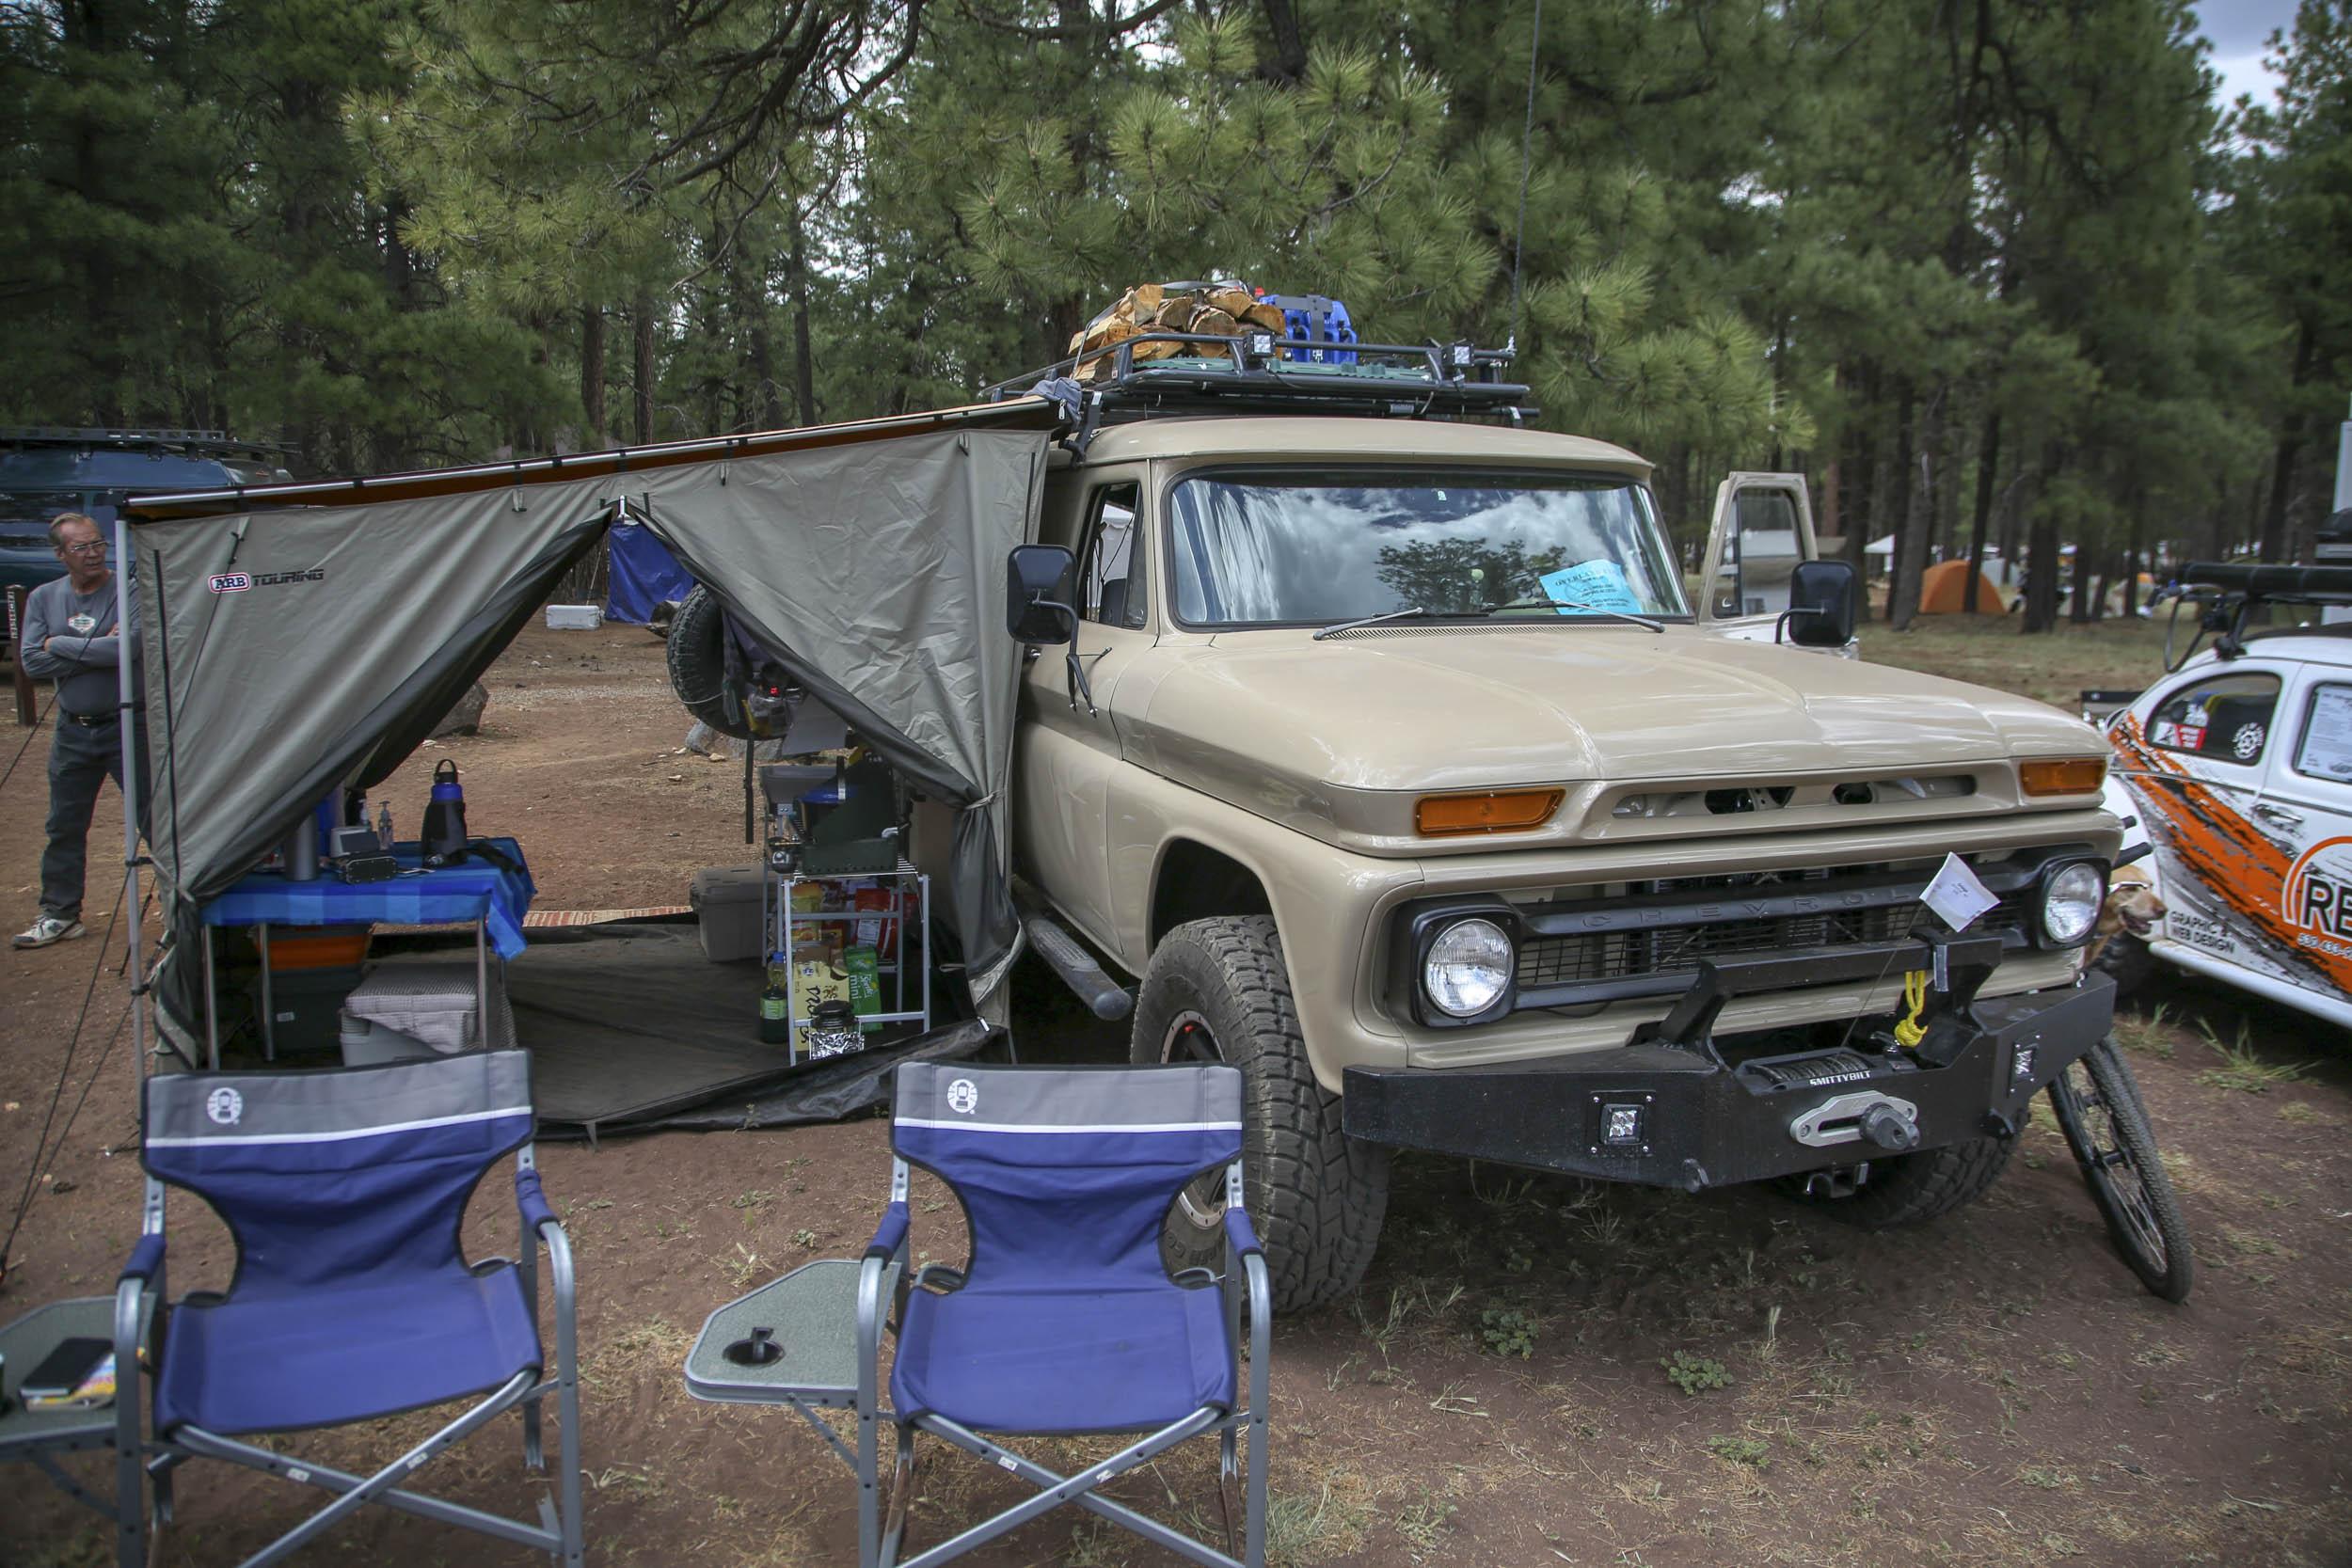 1966 Chevrolet Panel Truck camping setup